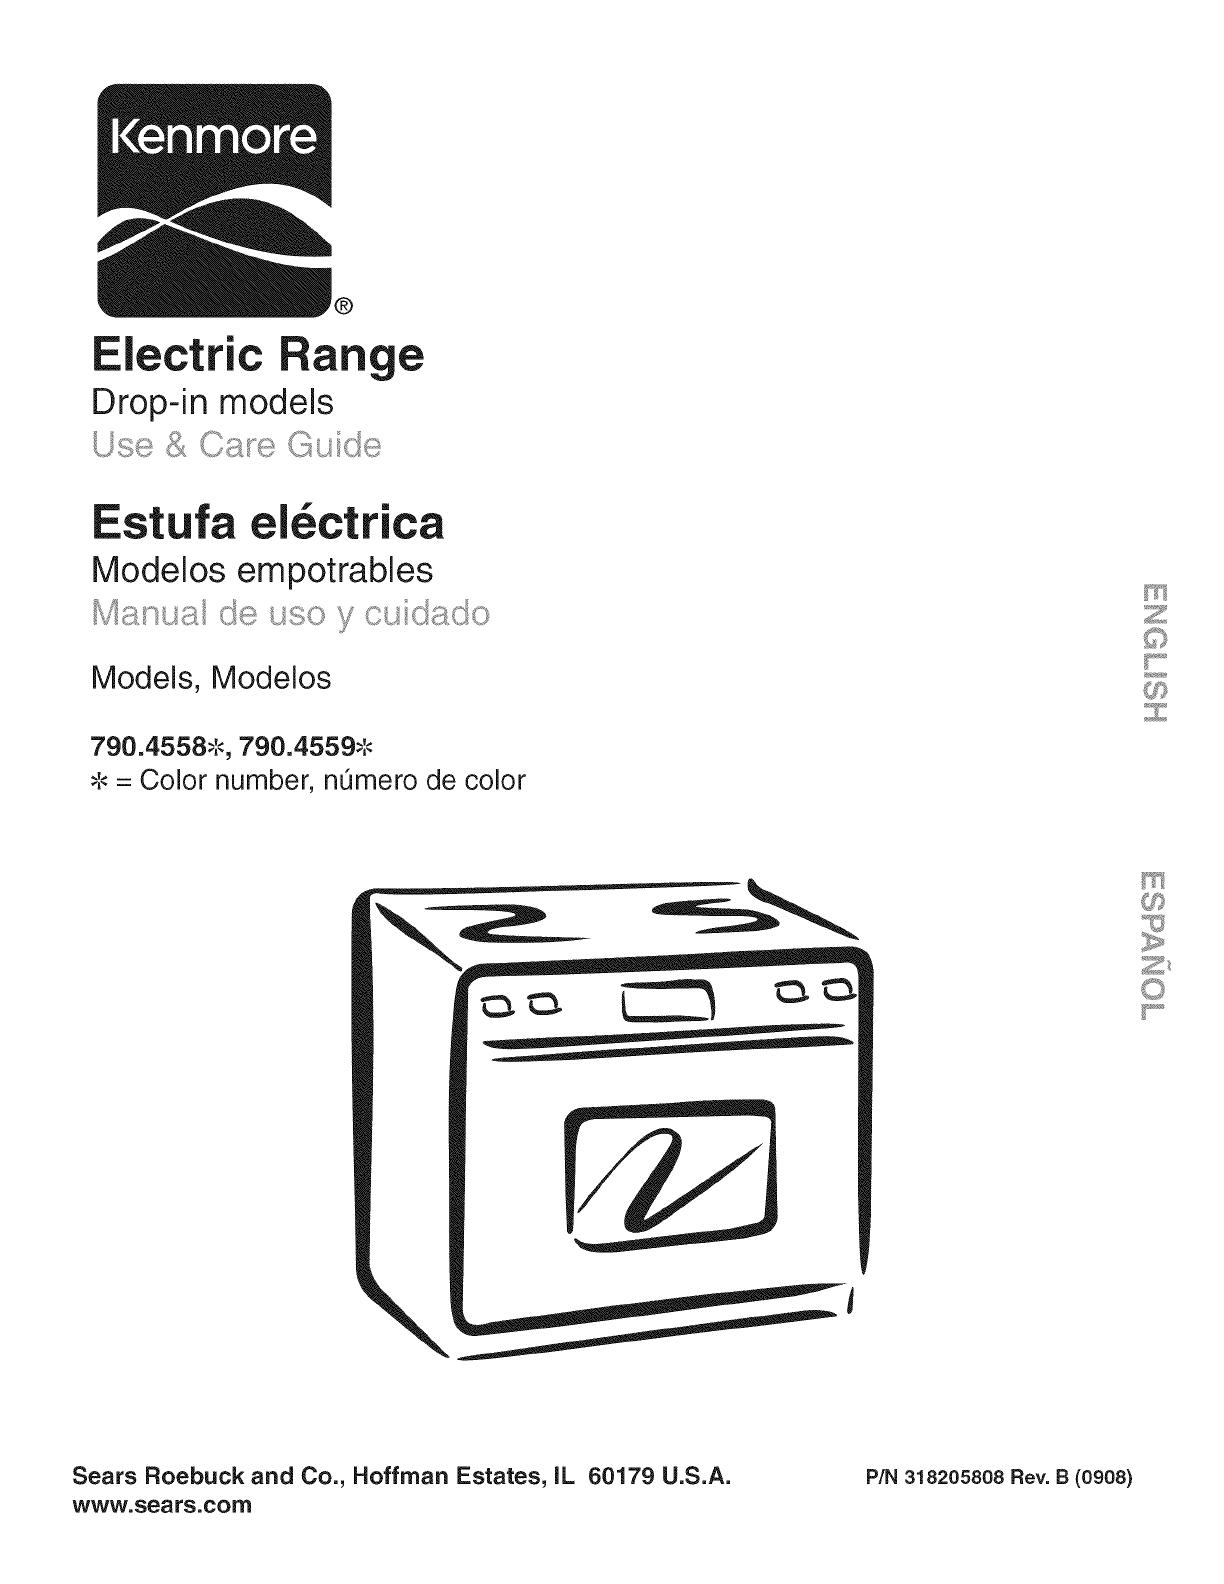 Kenmore 79045582902 User Manual ELECTRIC RANGE Manuals And